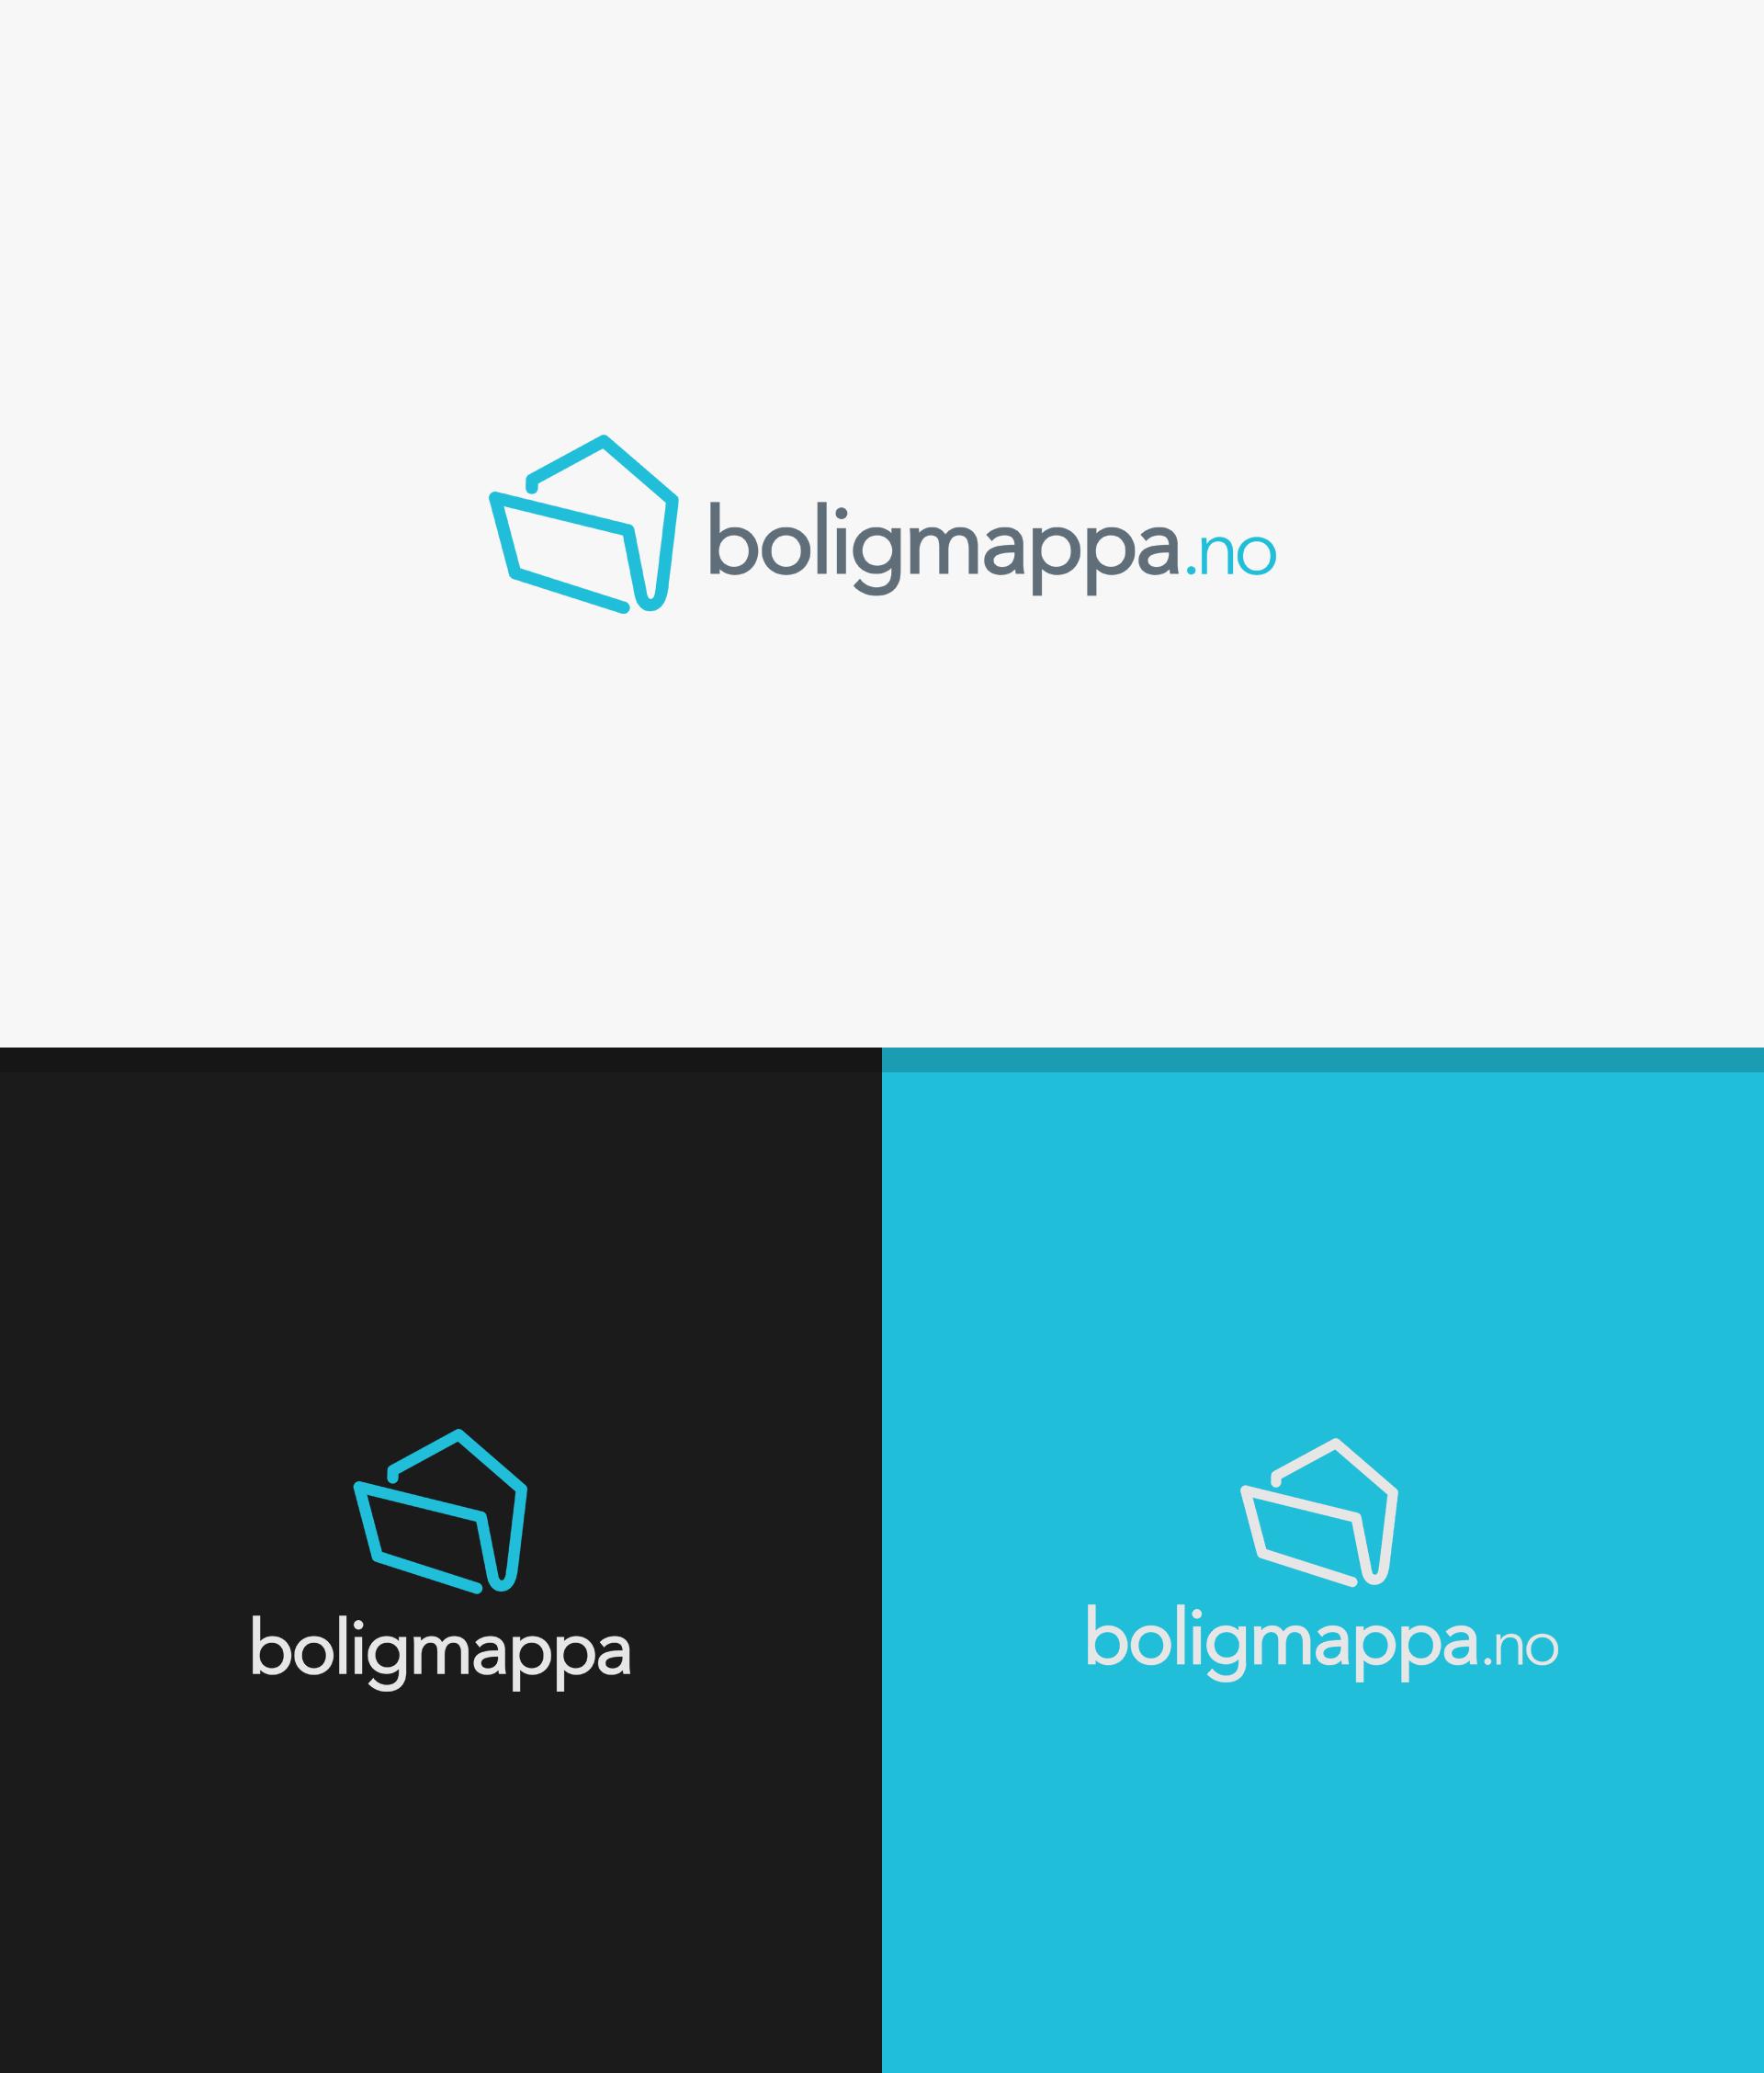 Total brand identity pack for innovative digital service Boligmappa.no